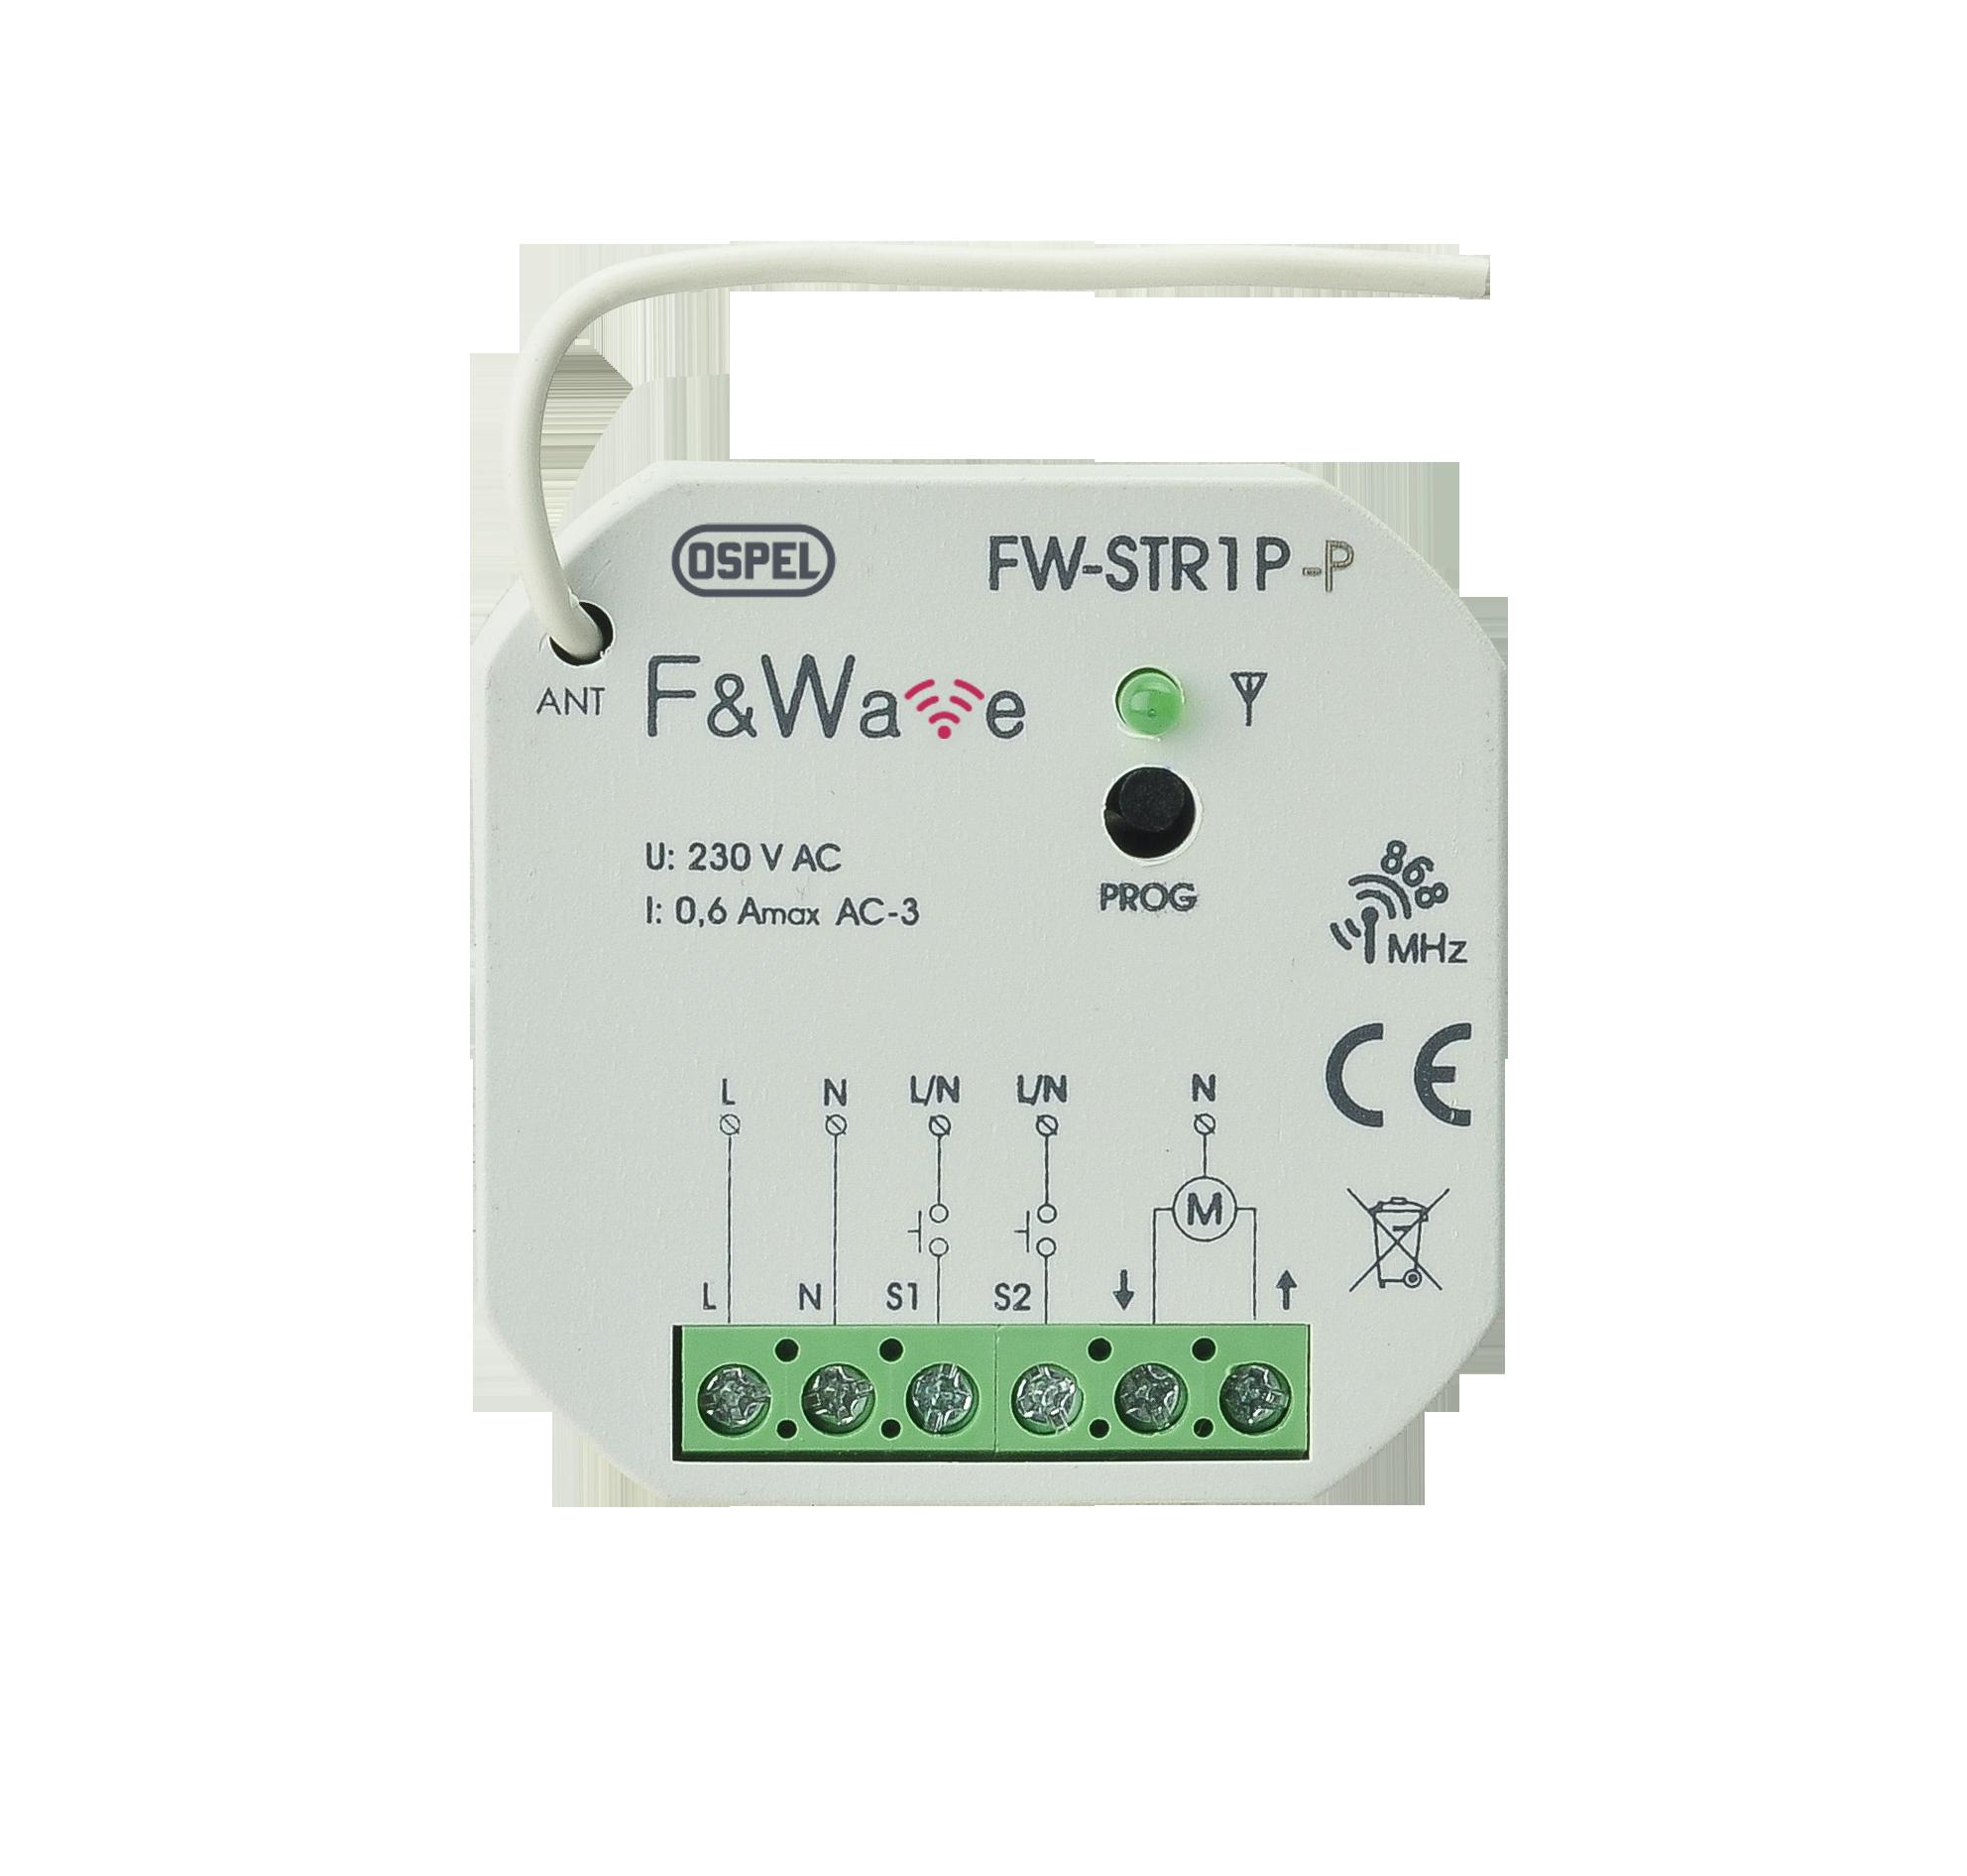 F&Wave - FW-STR1P-p_OSPEL logo